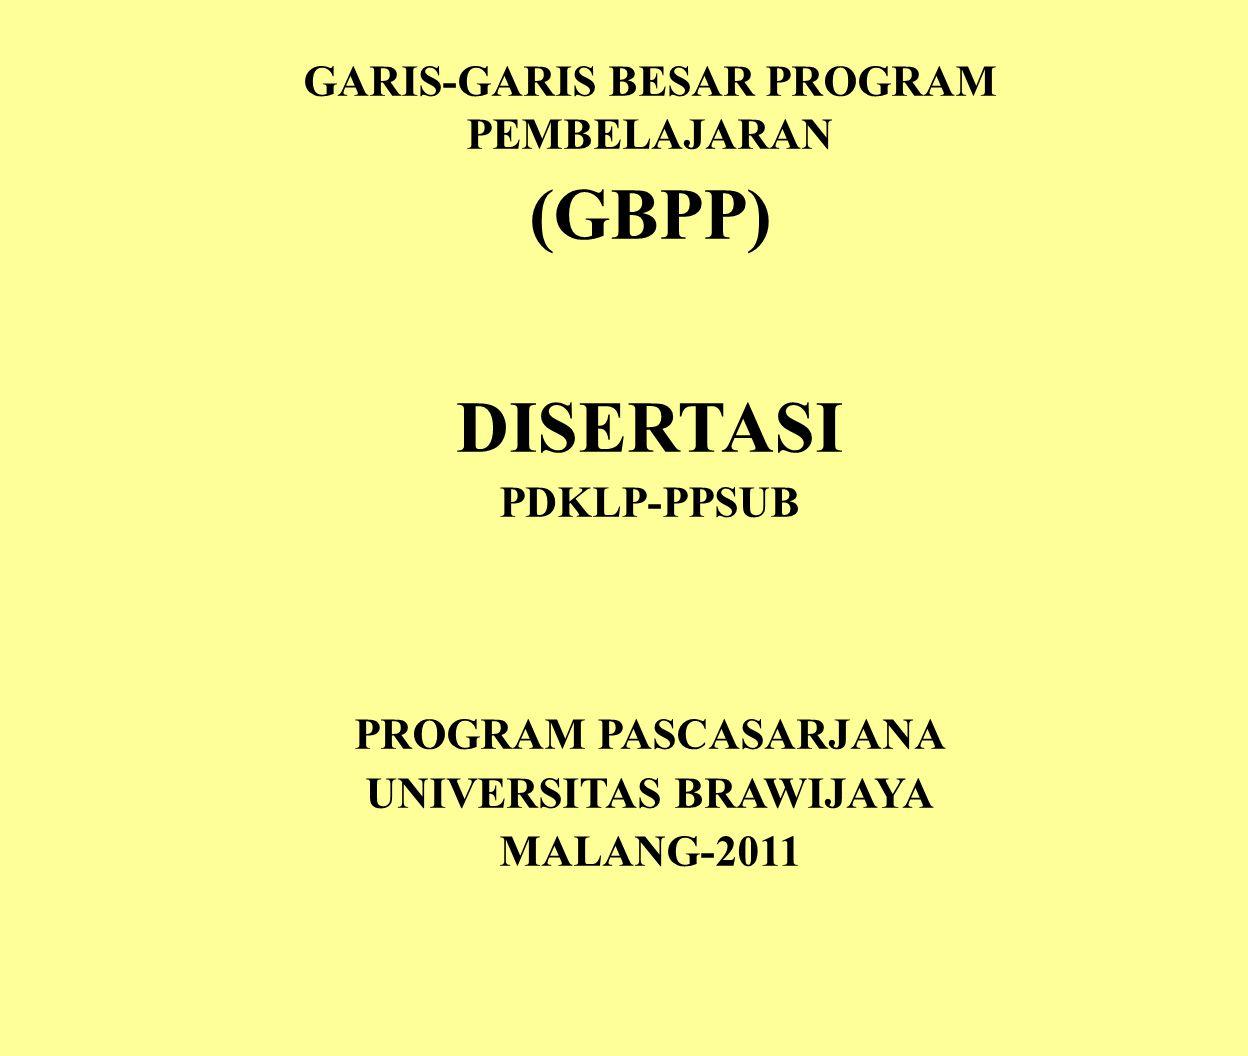 GARIS-GARIS BESAR PROGRAM PEMBELAJARAN (GBPP) DISERTASI PDKLP-PPSUB PROGRAM PASCASARJANA UNIVERSITAS BRAWIJAYA MALANG-2011